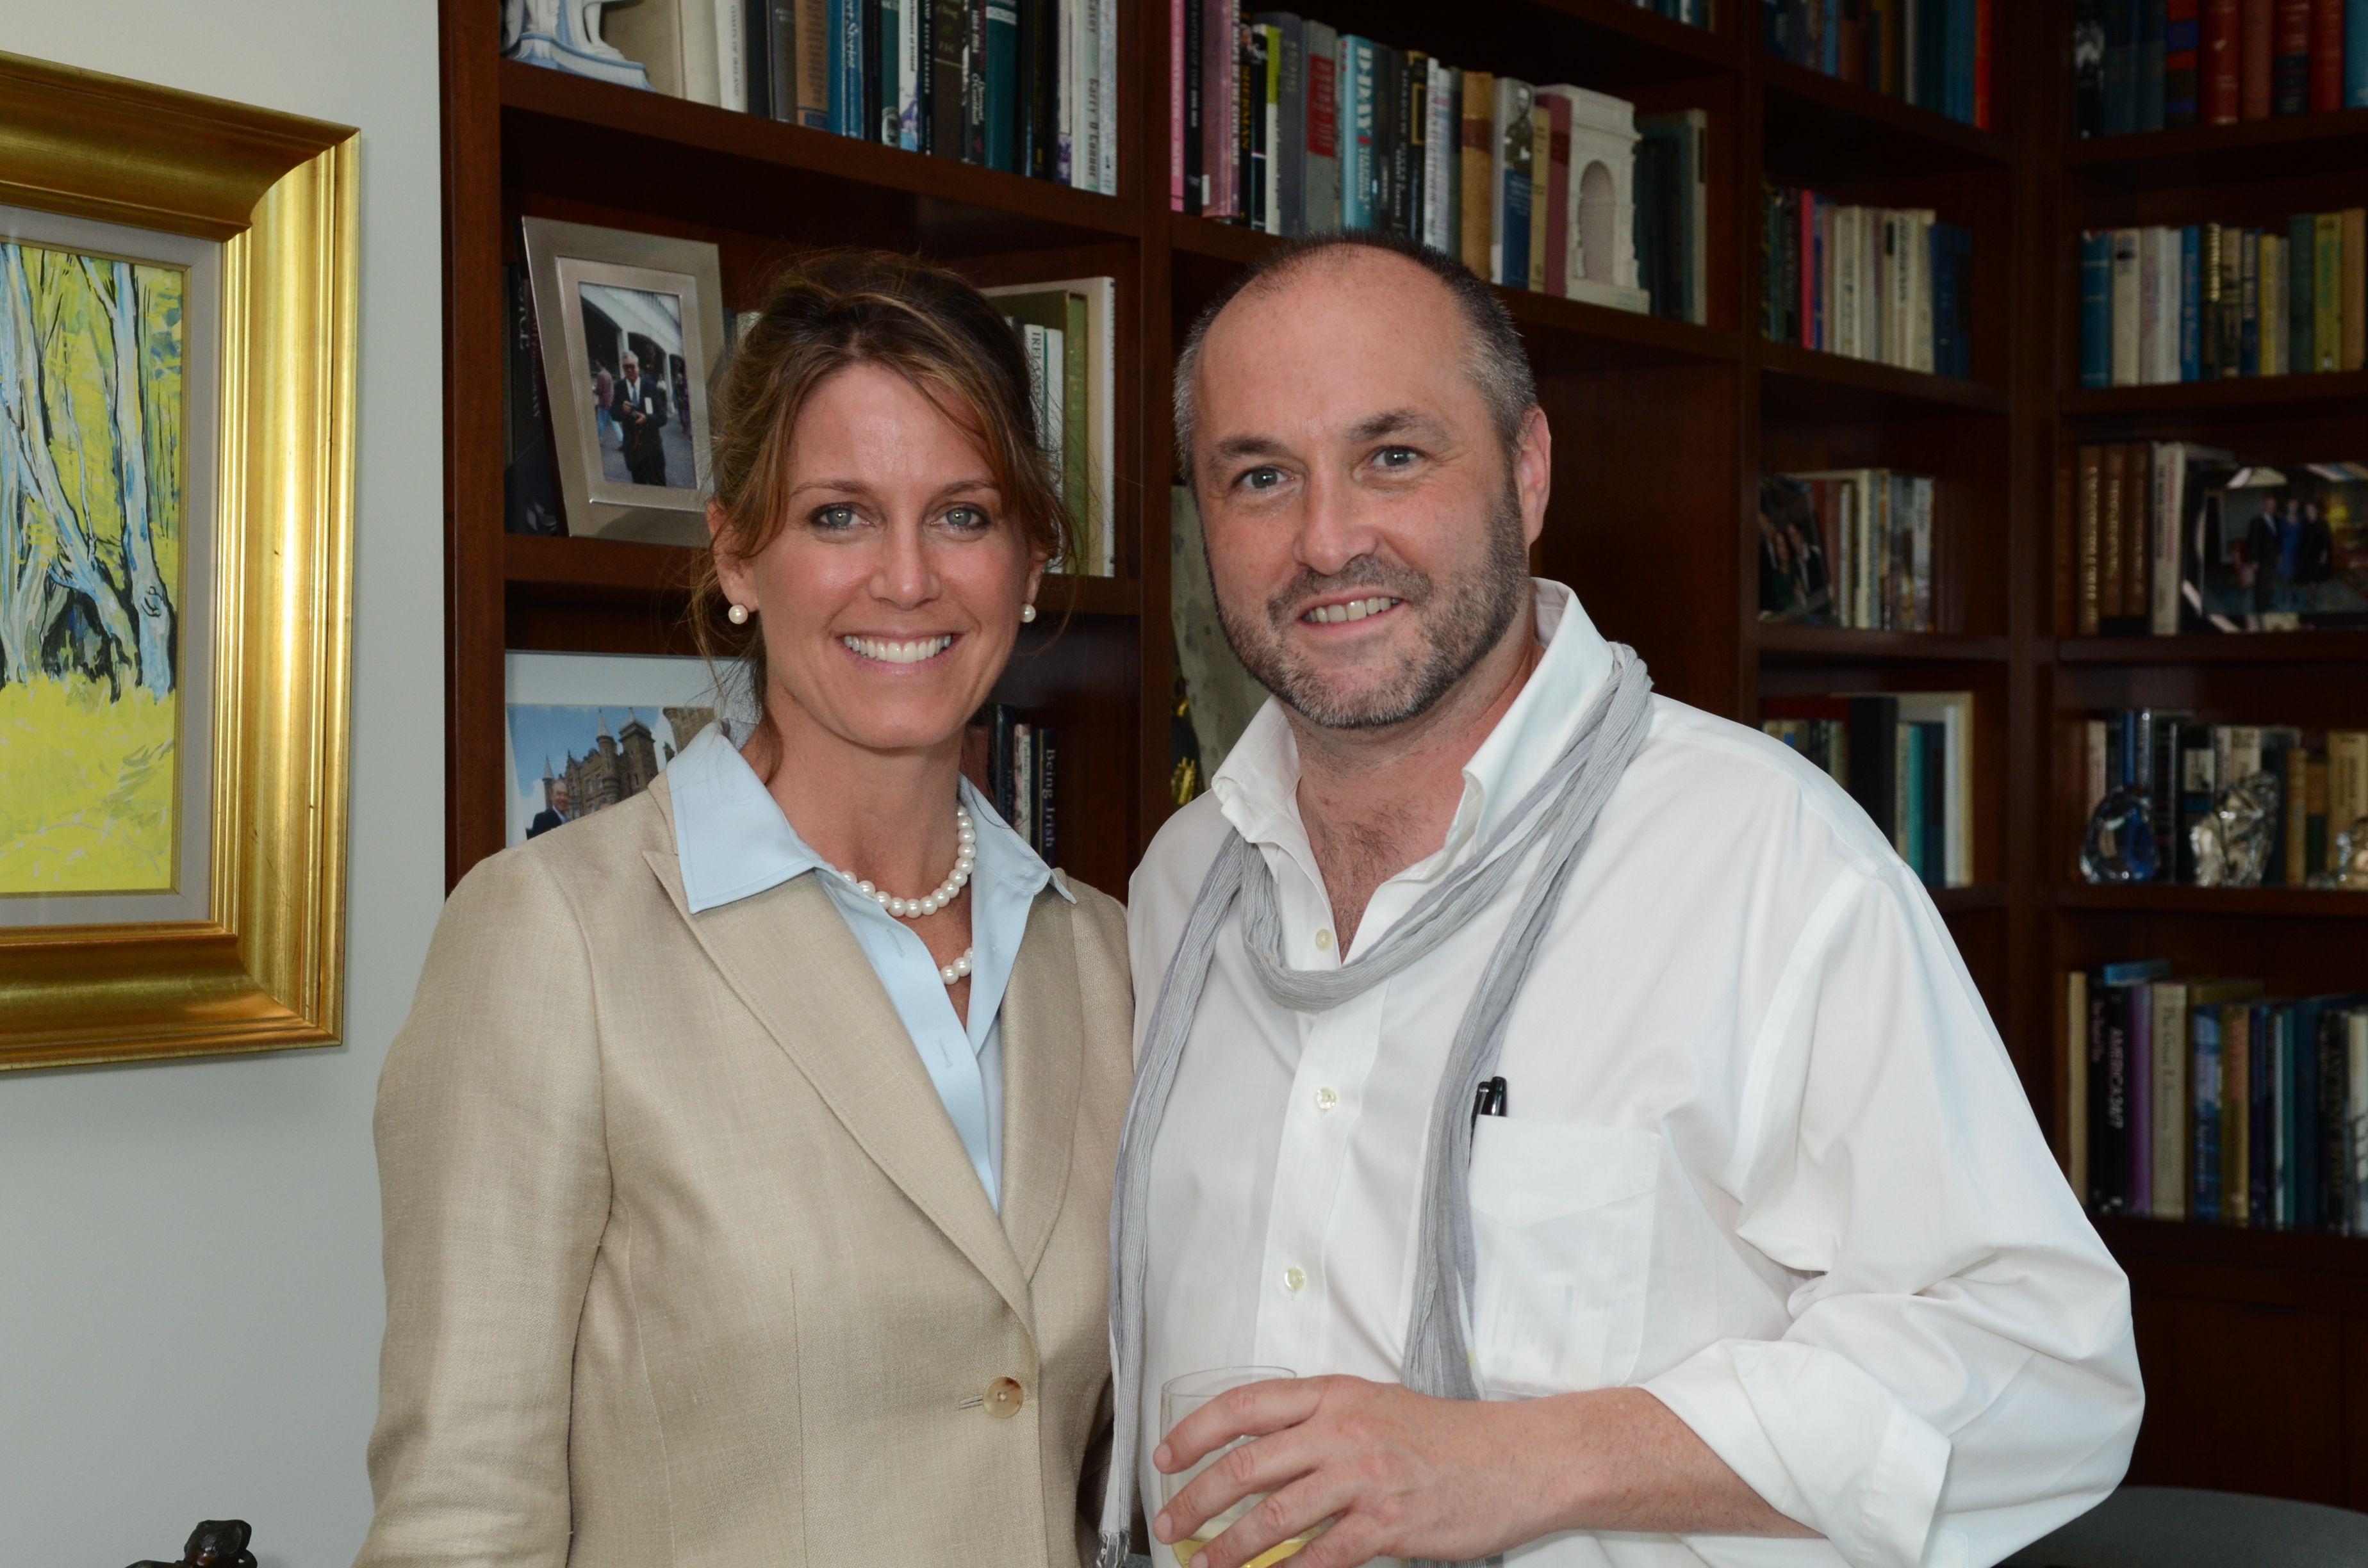 Lisa Consiglio and Colum McCann